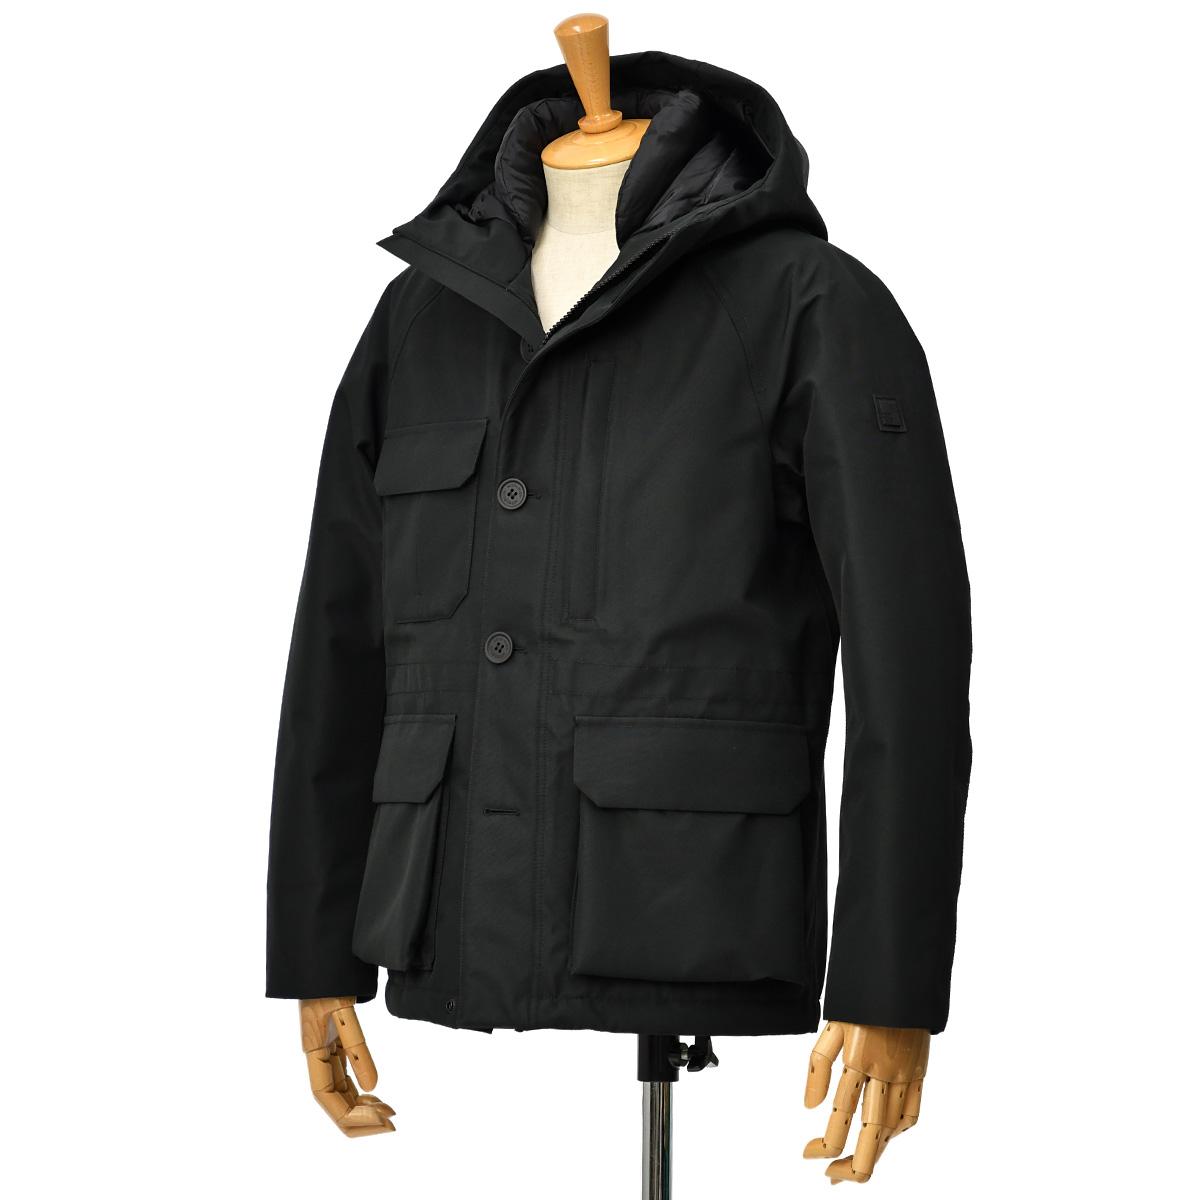 WOOLRICH【ウールリッチ】ダウンジャケット STORM MOUTAIN JKT WOCPS2917 OFF BLACK ブラック